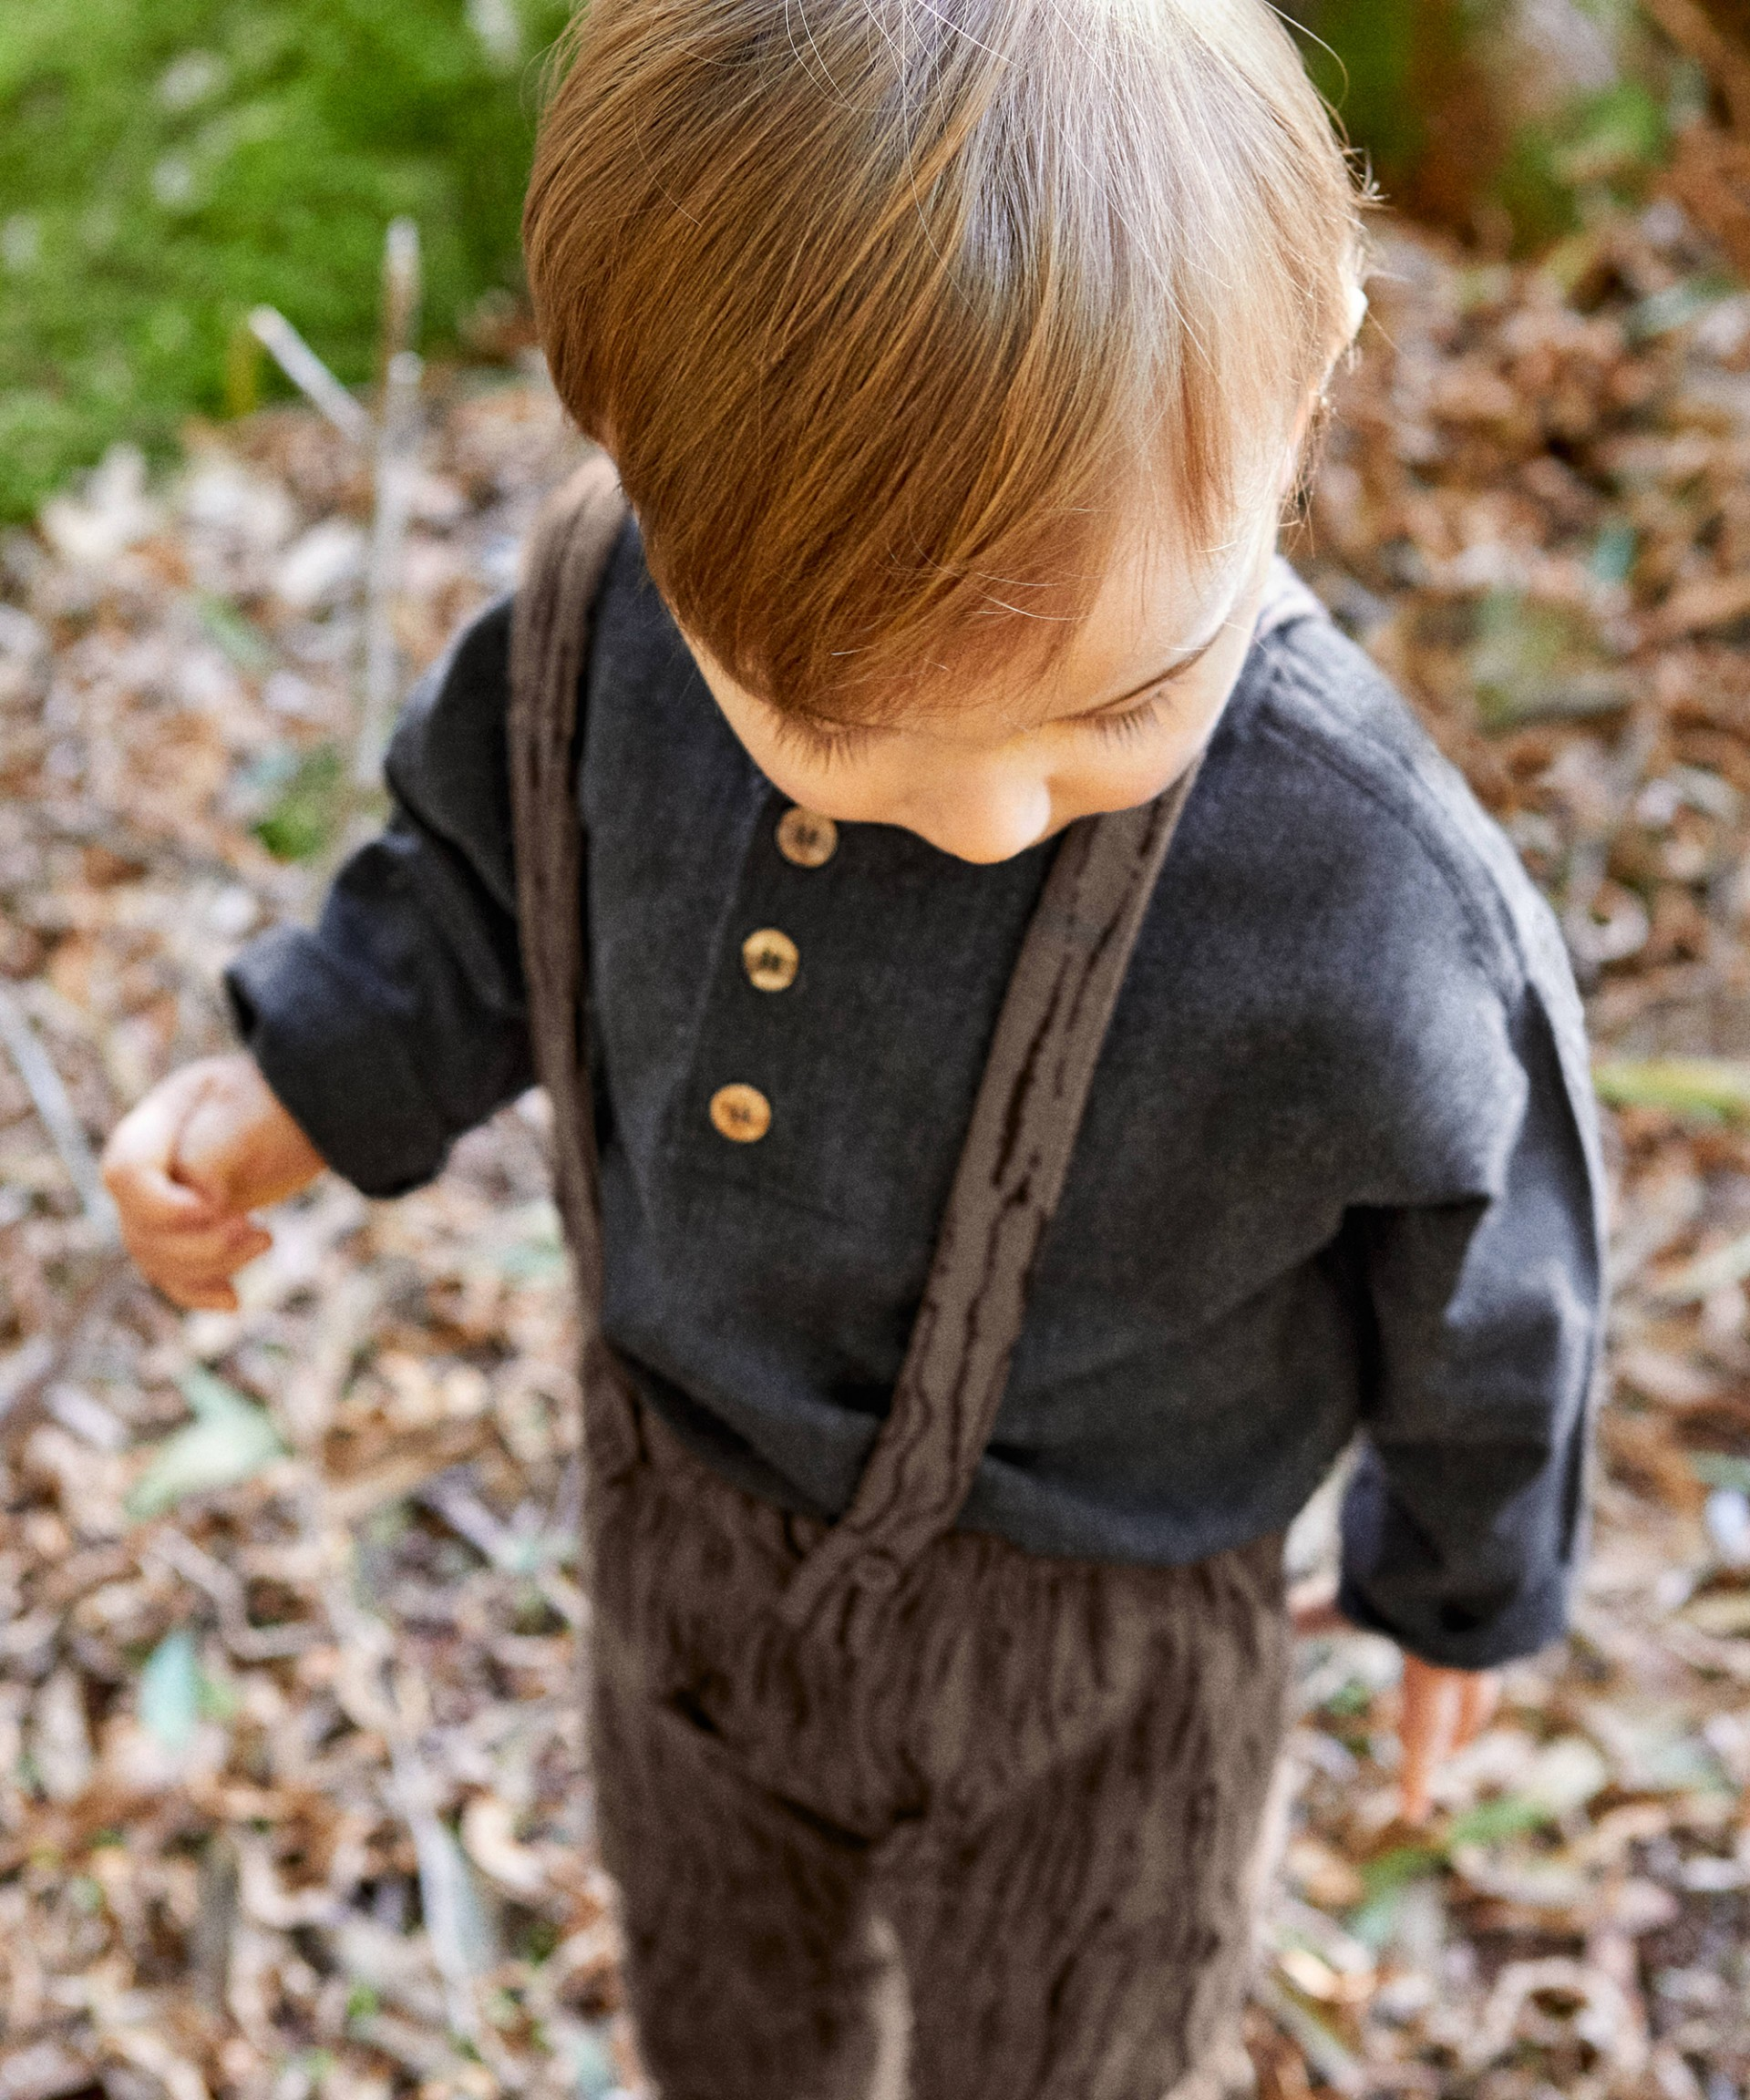 Pantaloni con bretelle | Woodwork